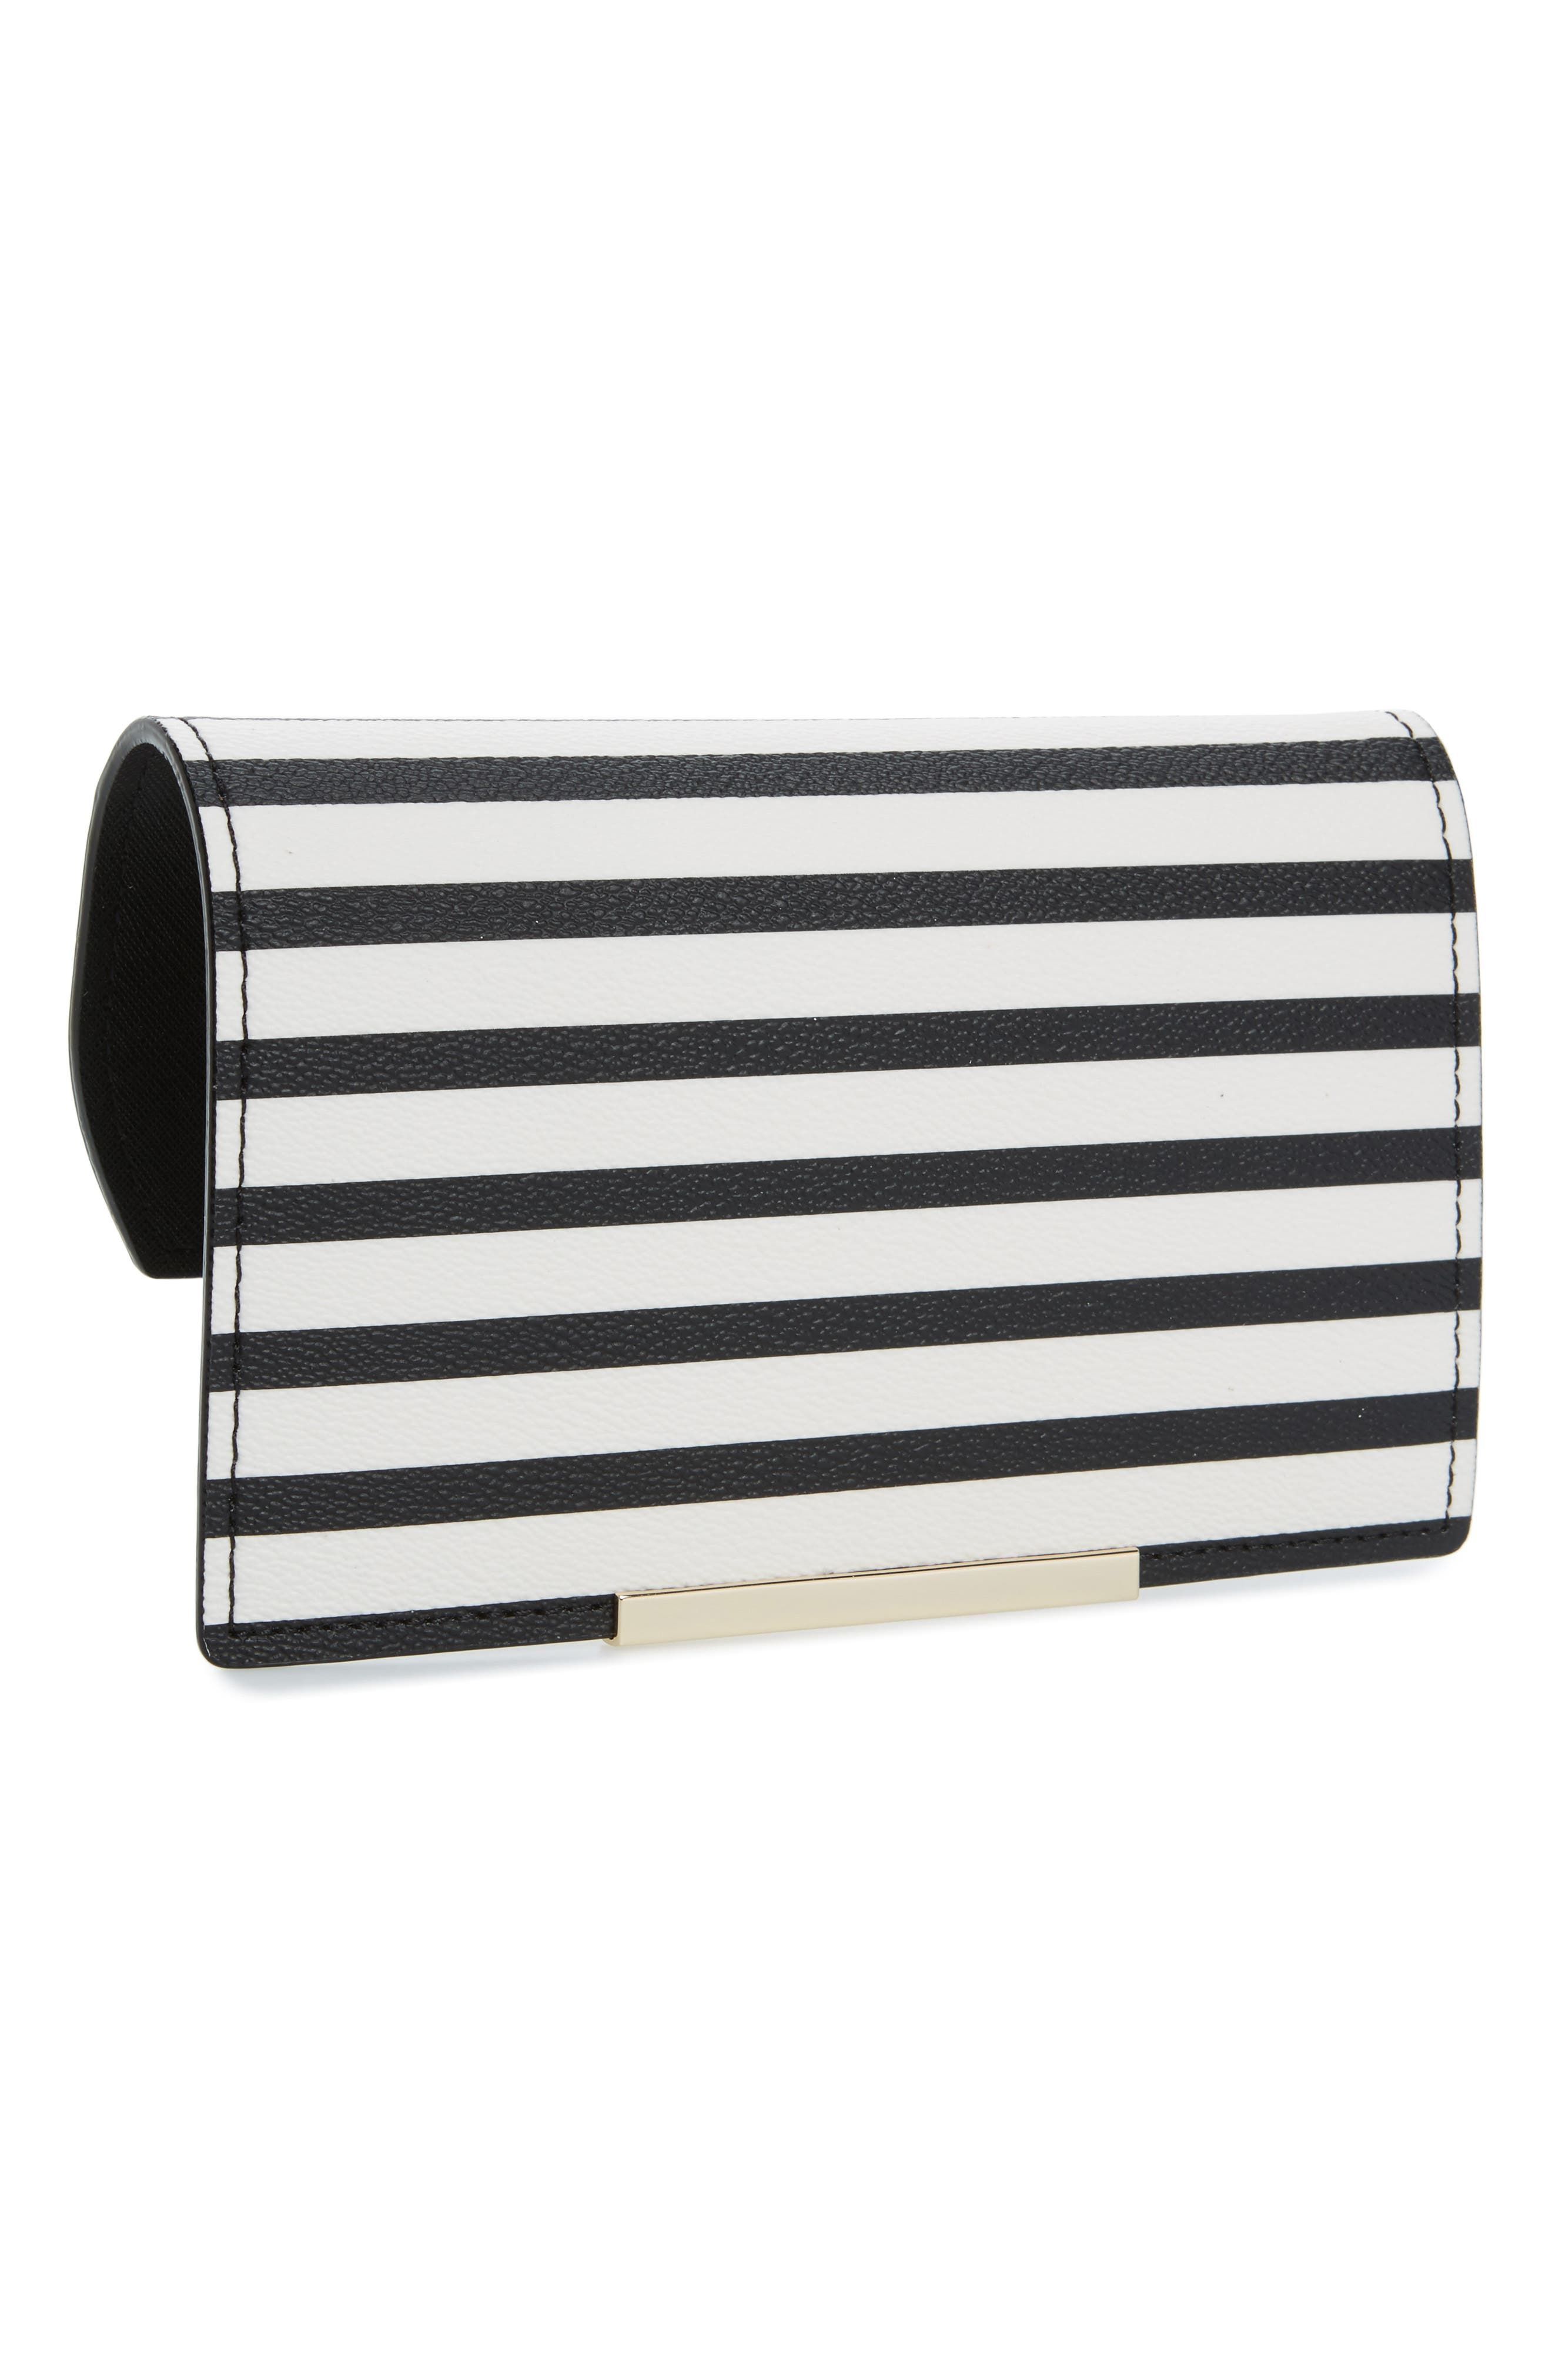 make it mine stripe snap-on accent flap,                         Main,                         color, Cement/ Black